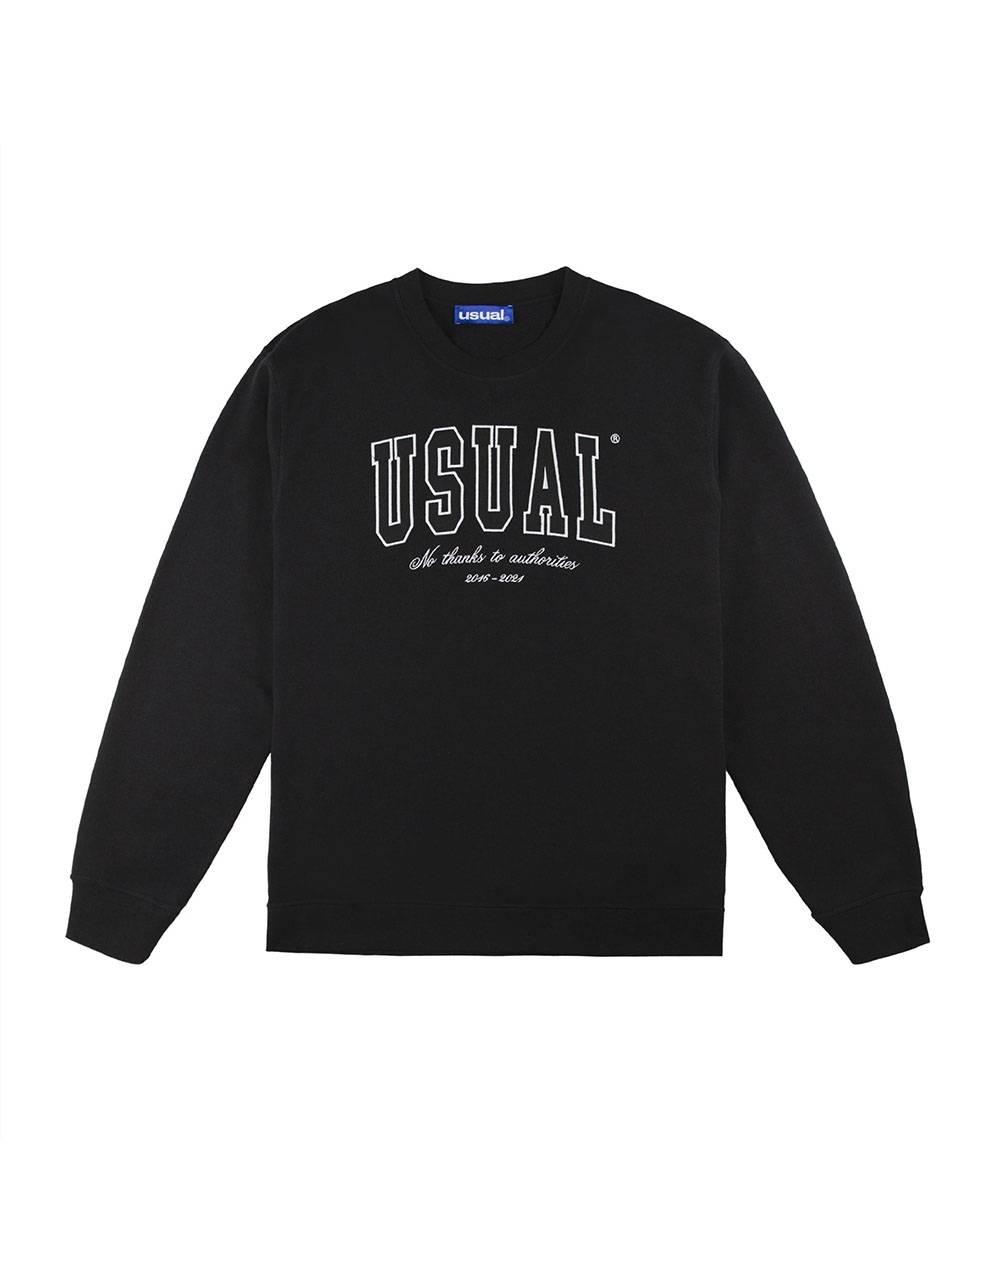 Usual No Thanx Crewneck sweatshirt - black Usual Sweater 94,26€